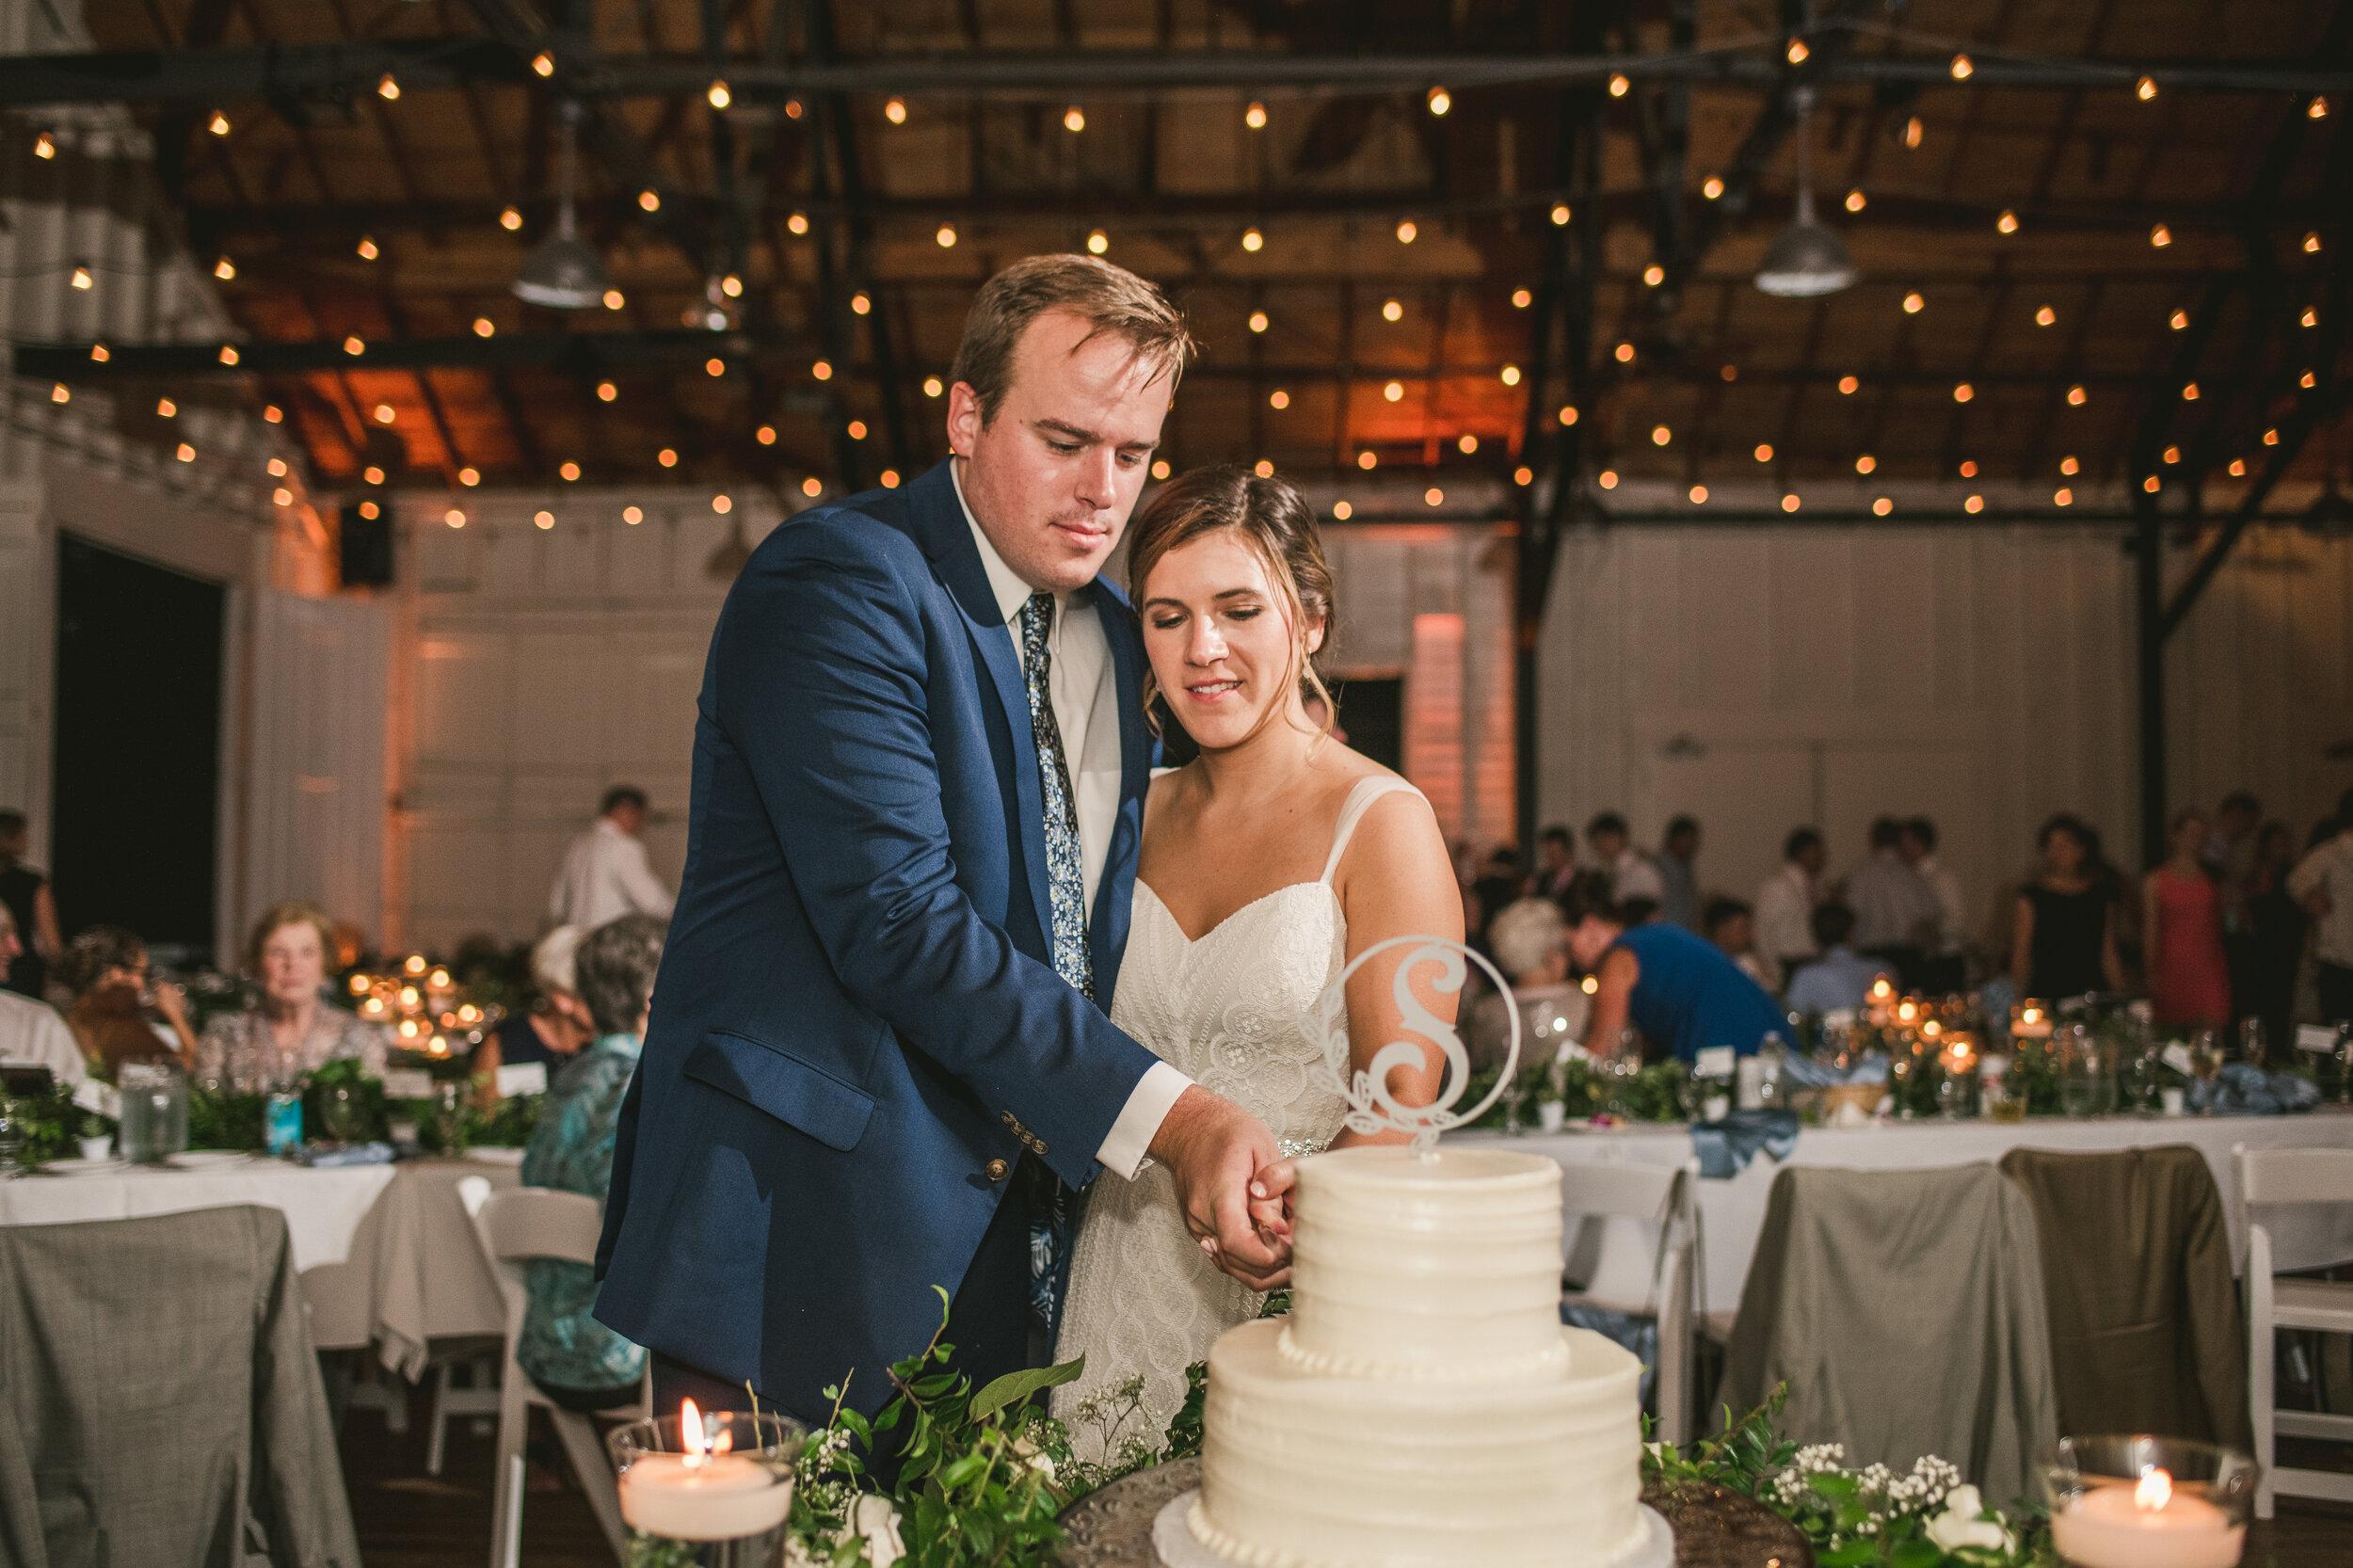 Becca-Cassin-Wedding-Favorites-103-photo.jpg